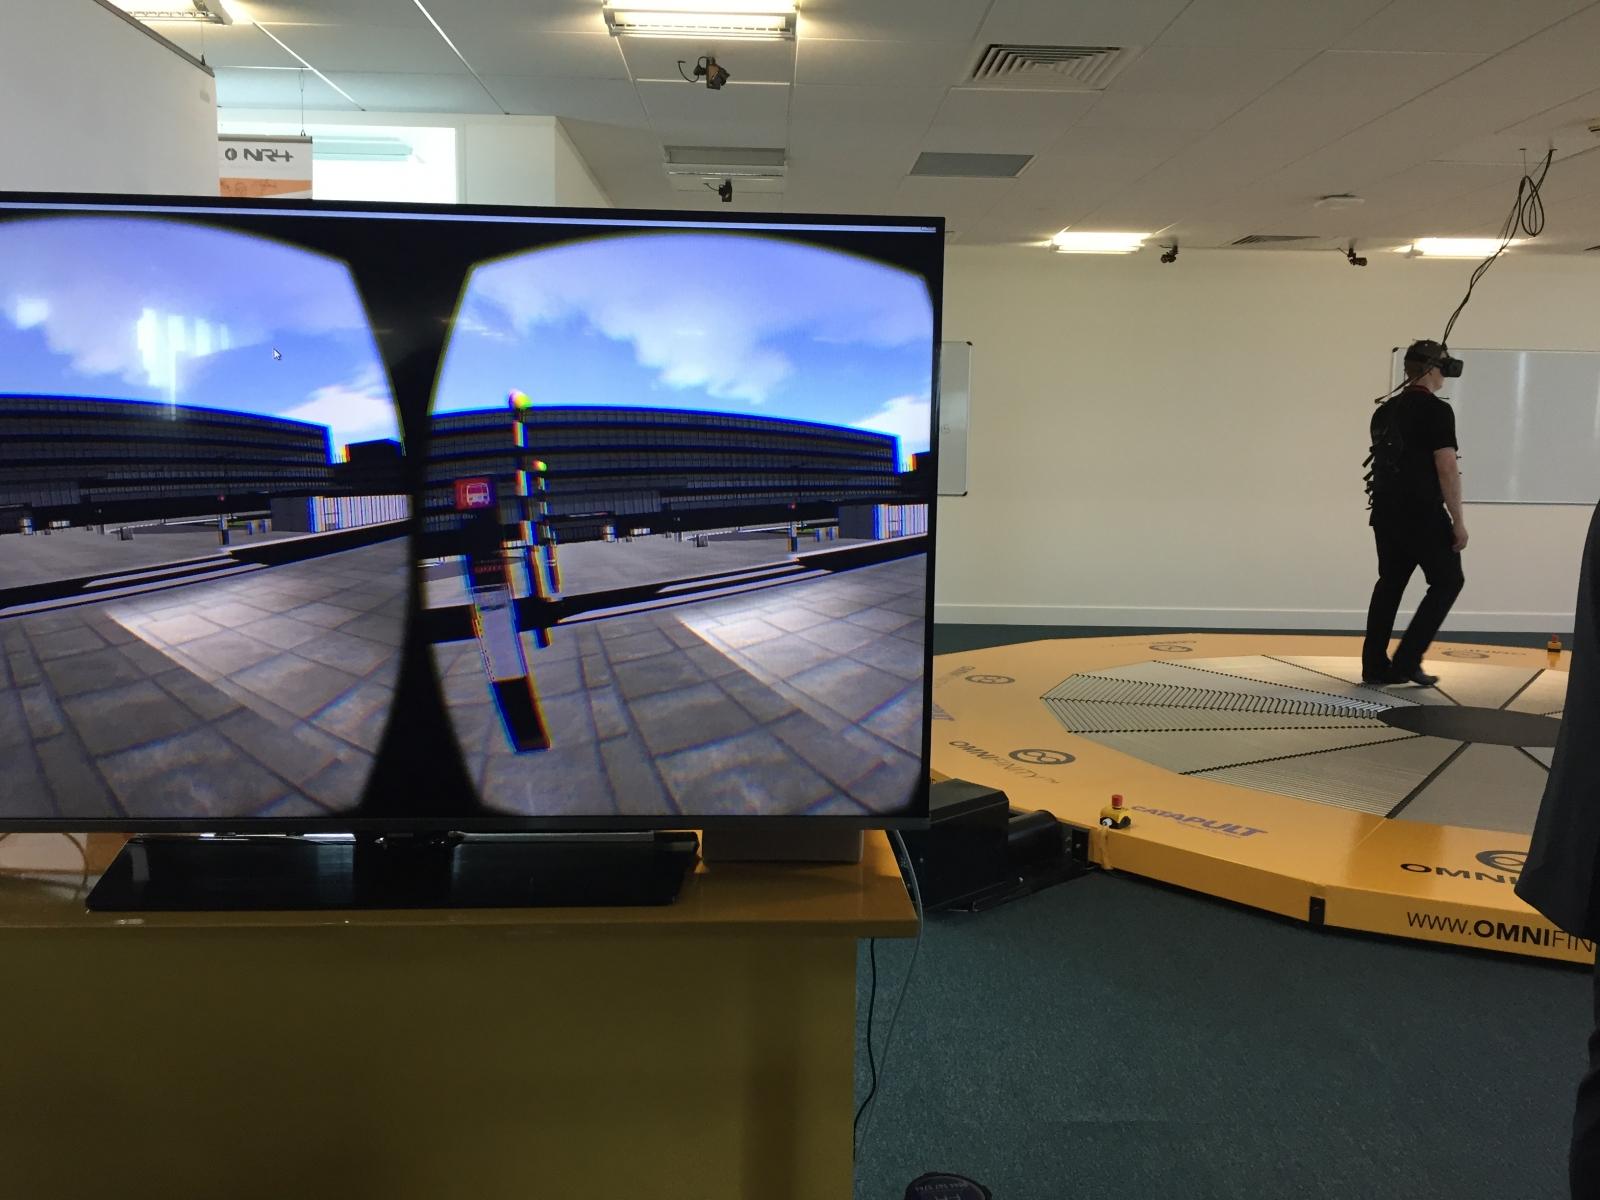 Omnifinity Omnideck VR oculus rift